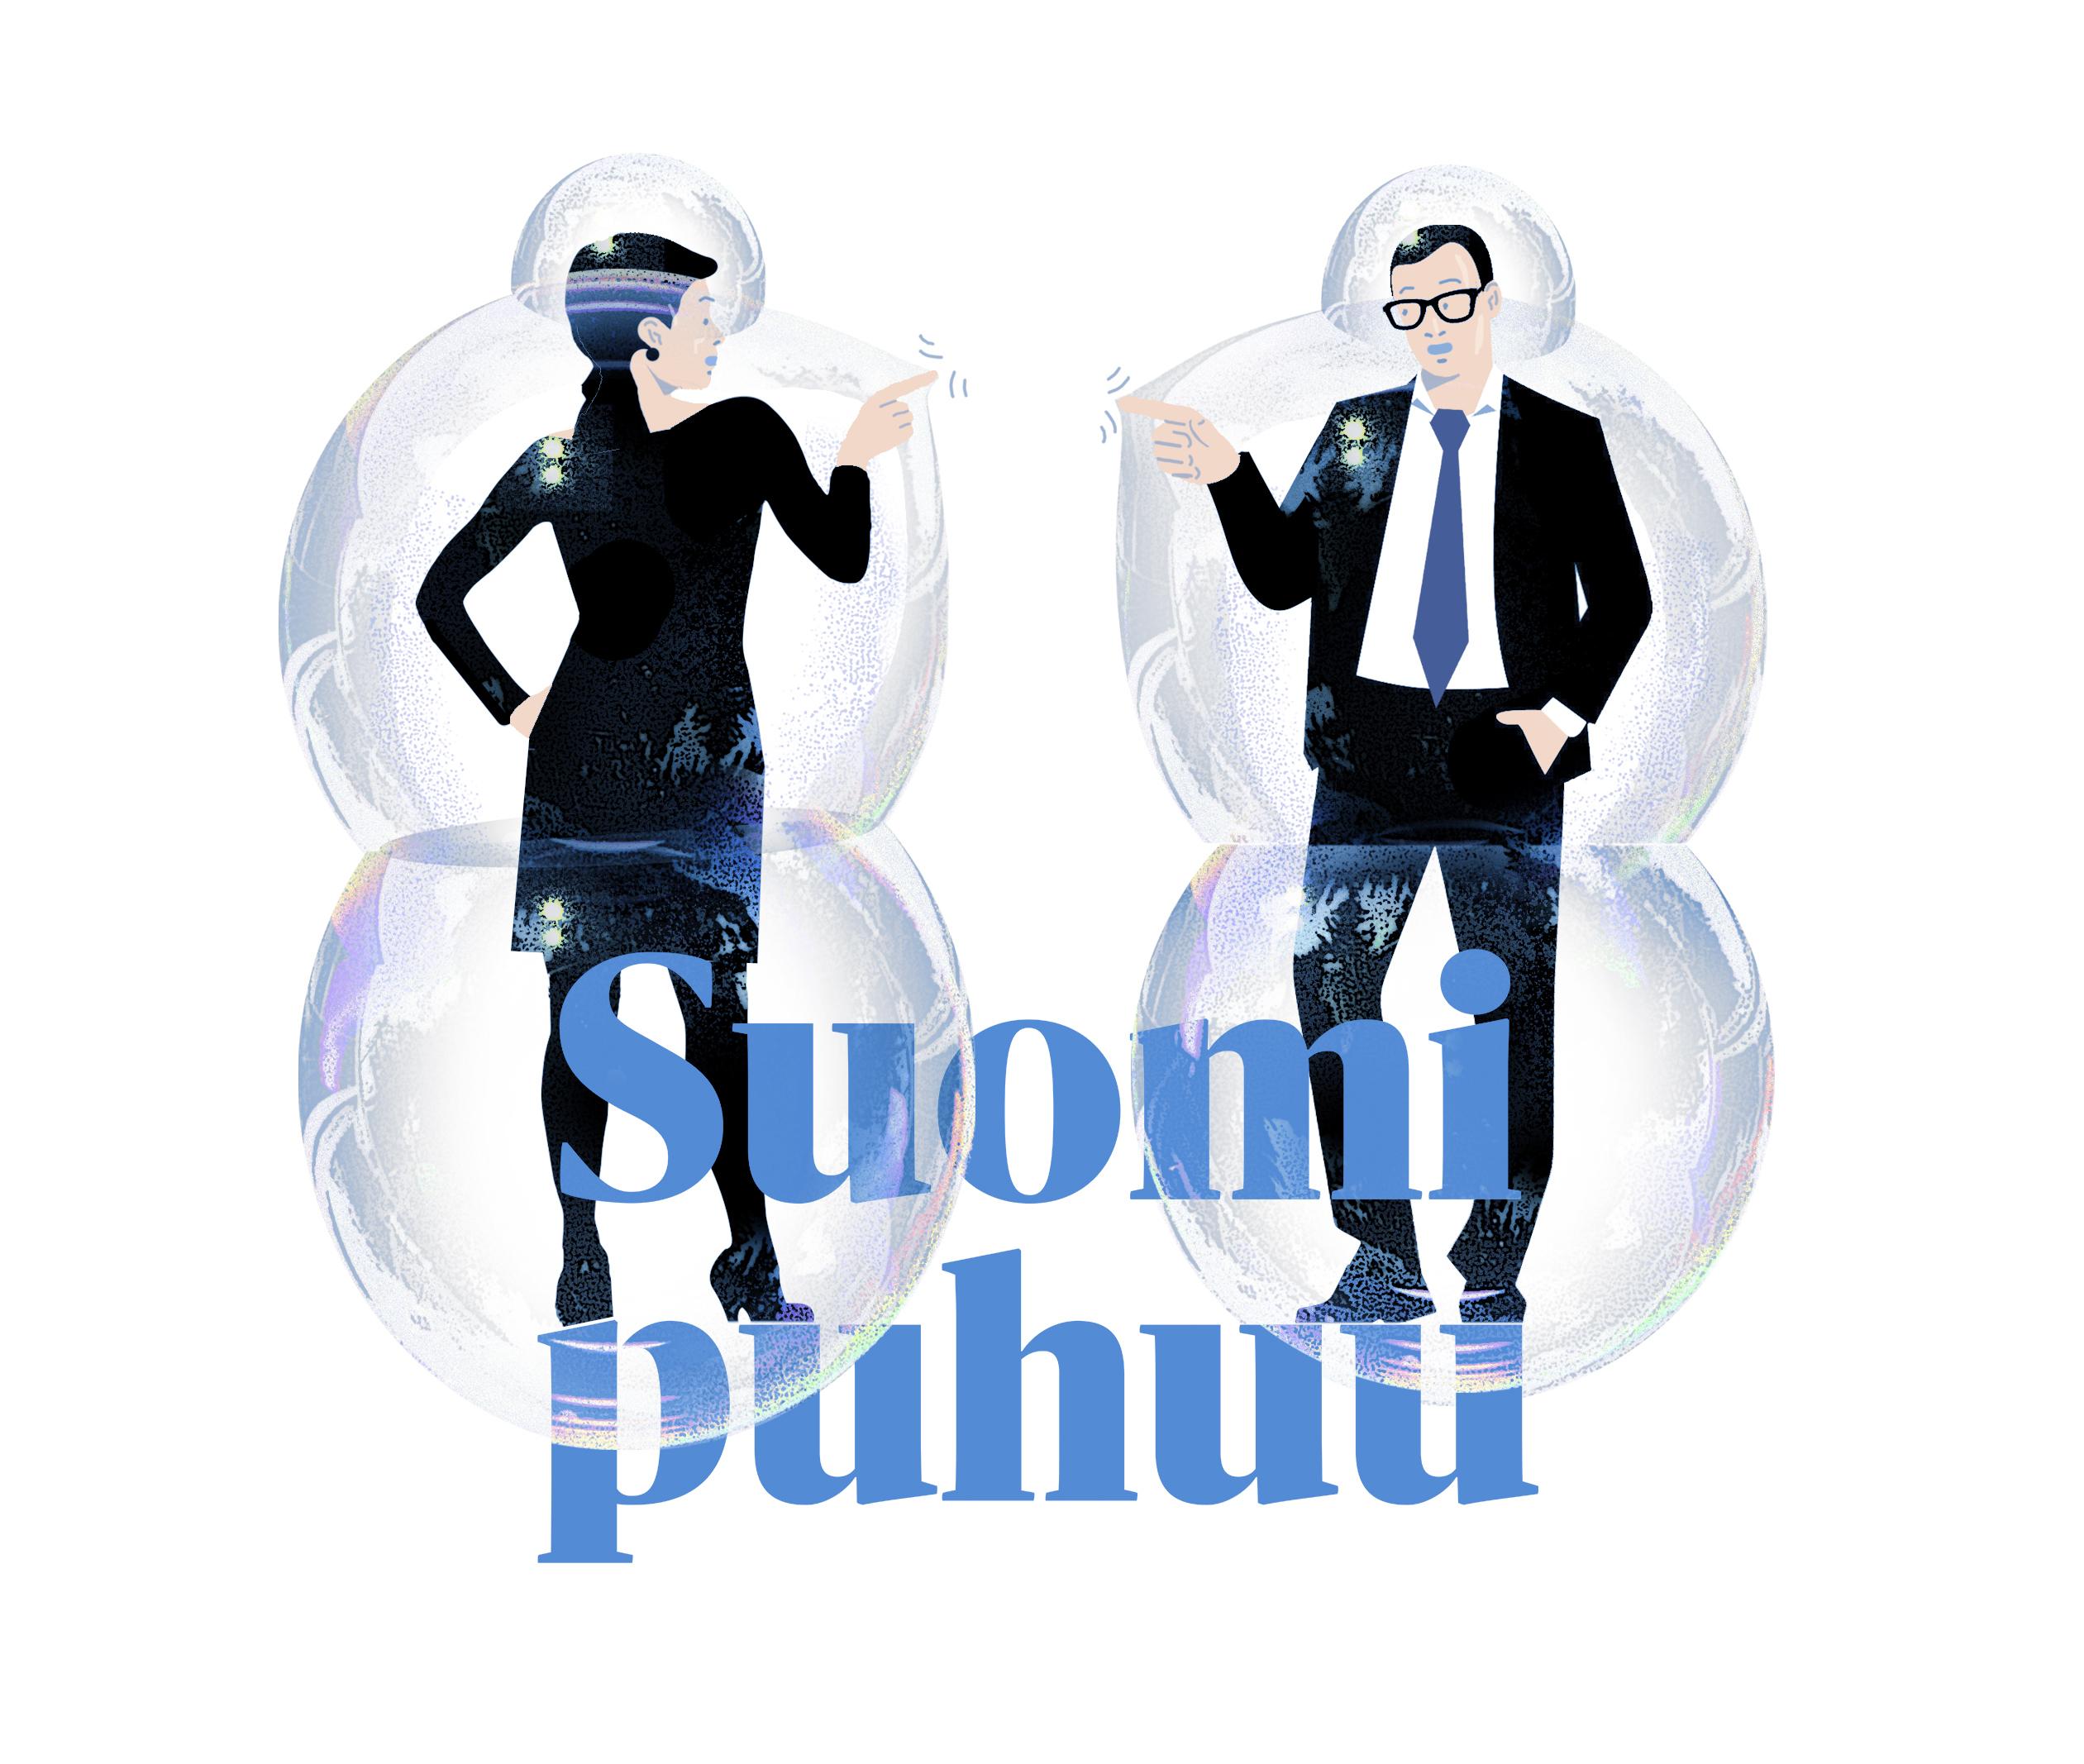 Vinjetti-HS-Suomi-puhuu-teksti-3.0